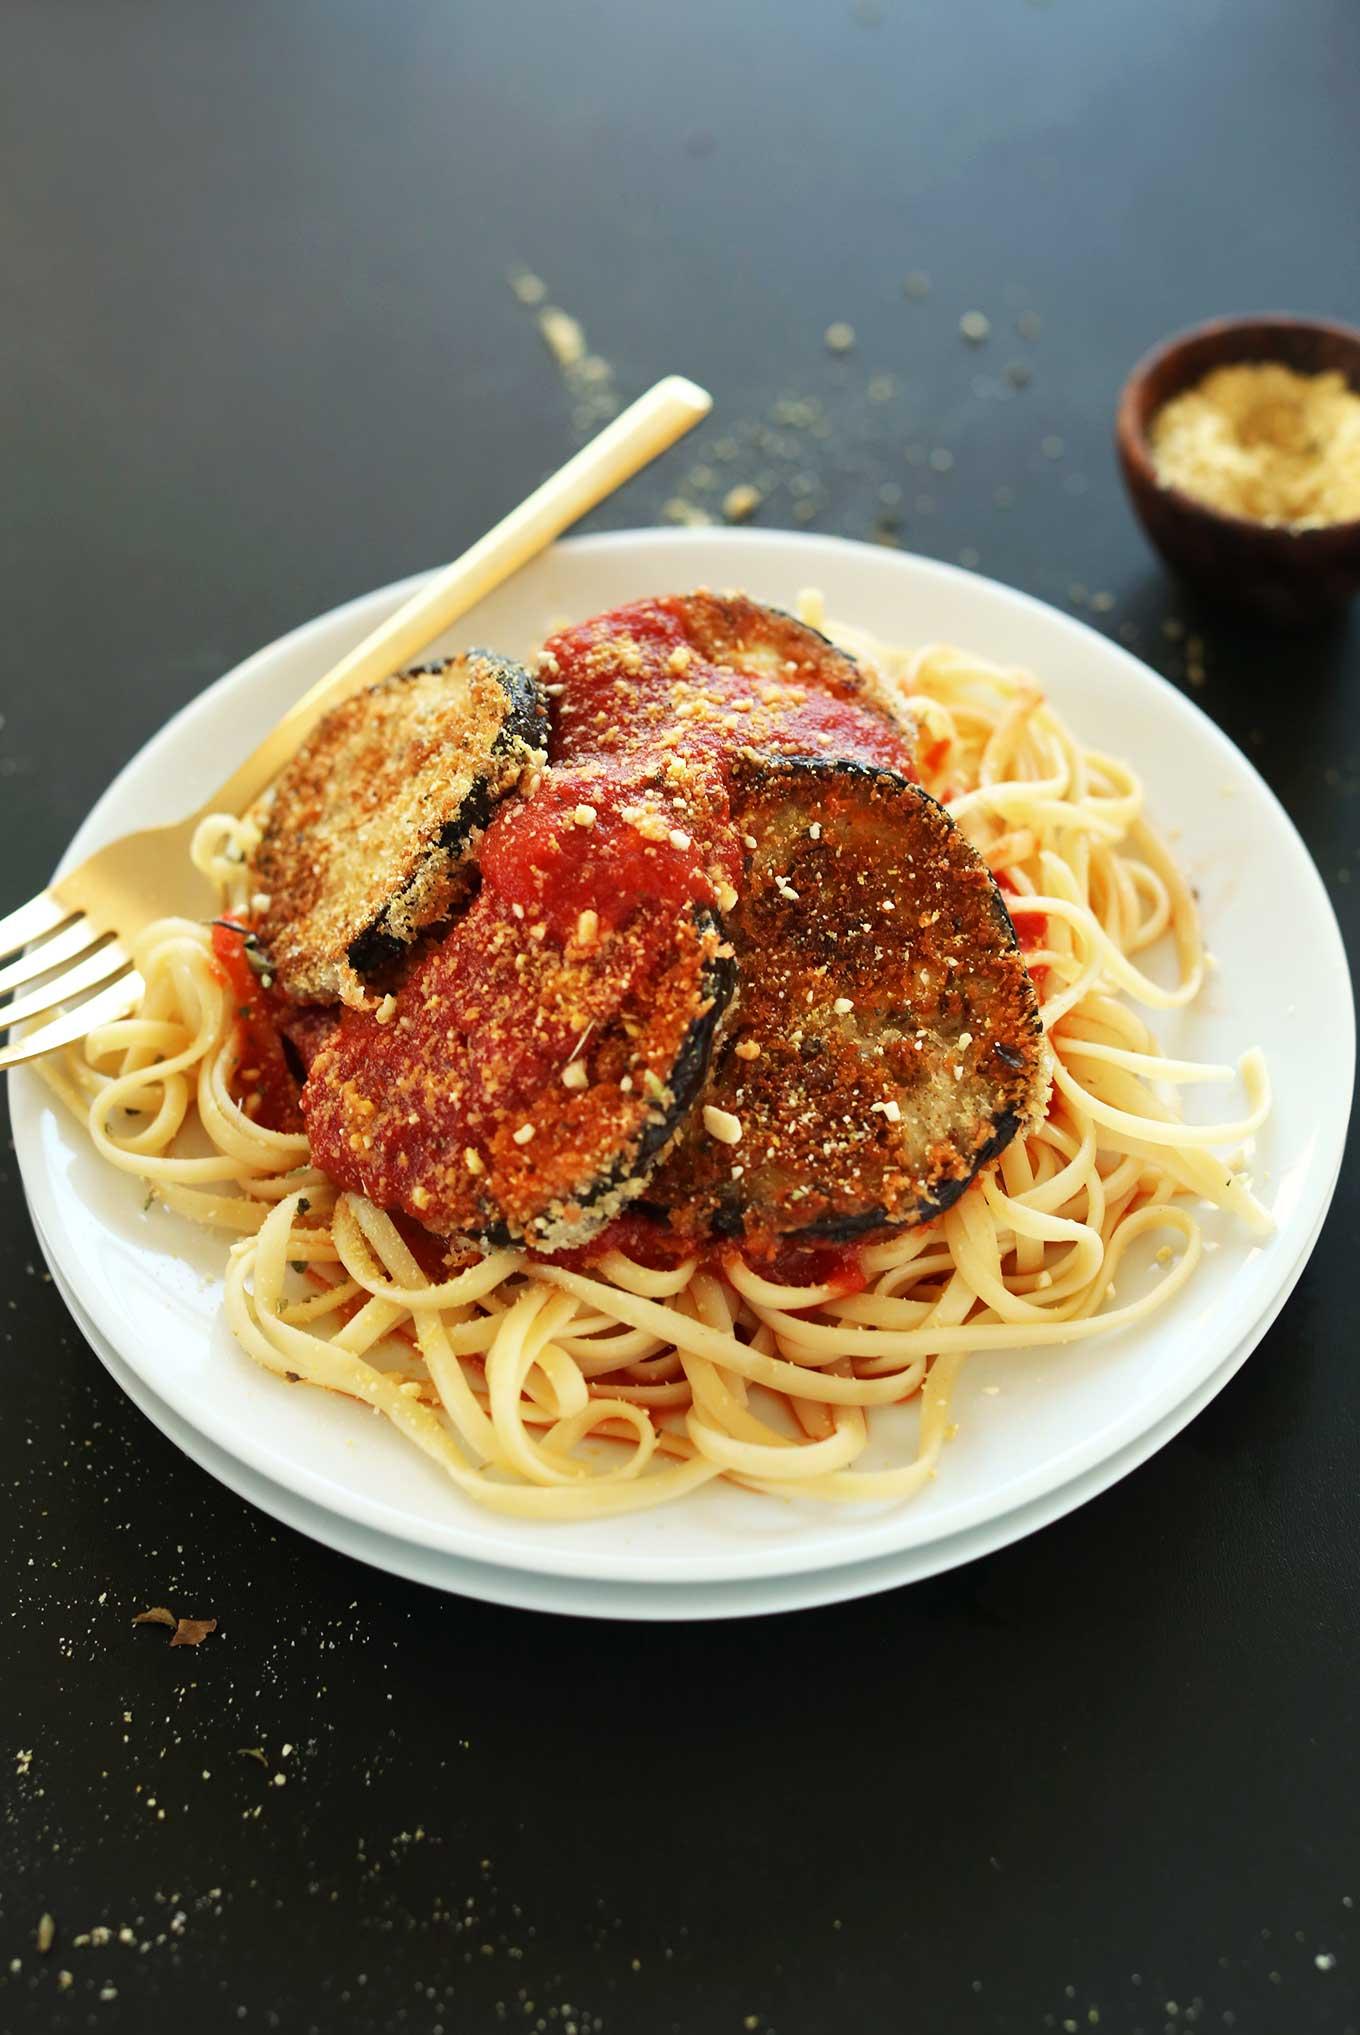 Plate loaded with noodles, marinara, and vegan eggplant parmesan